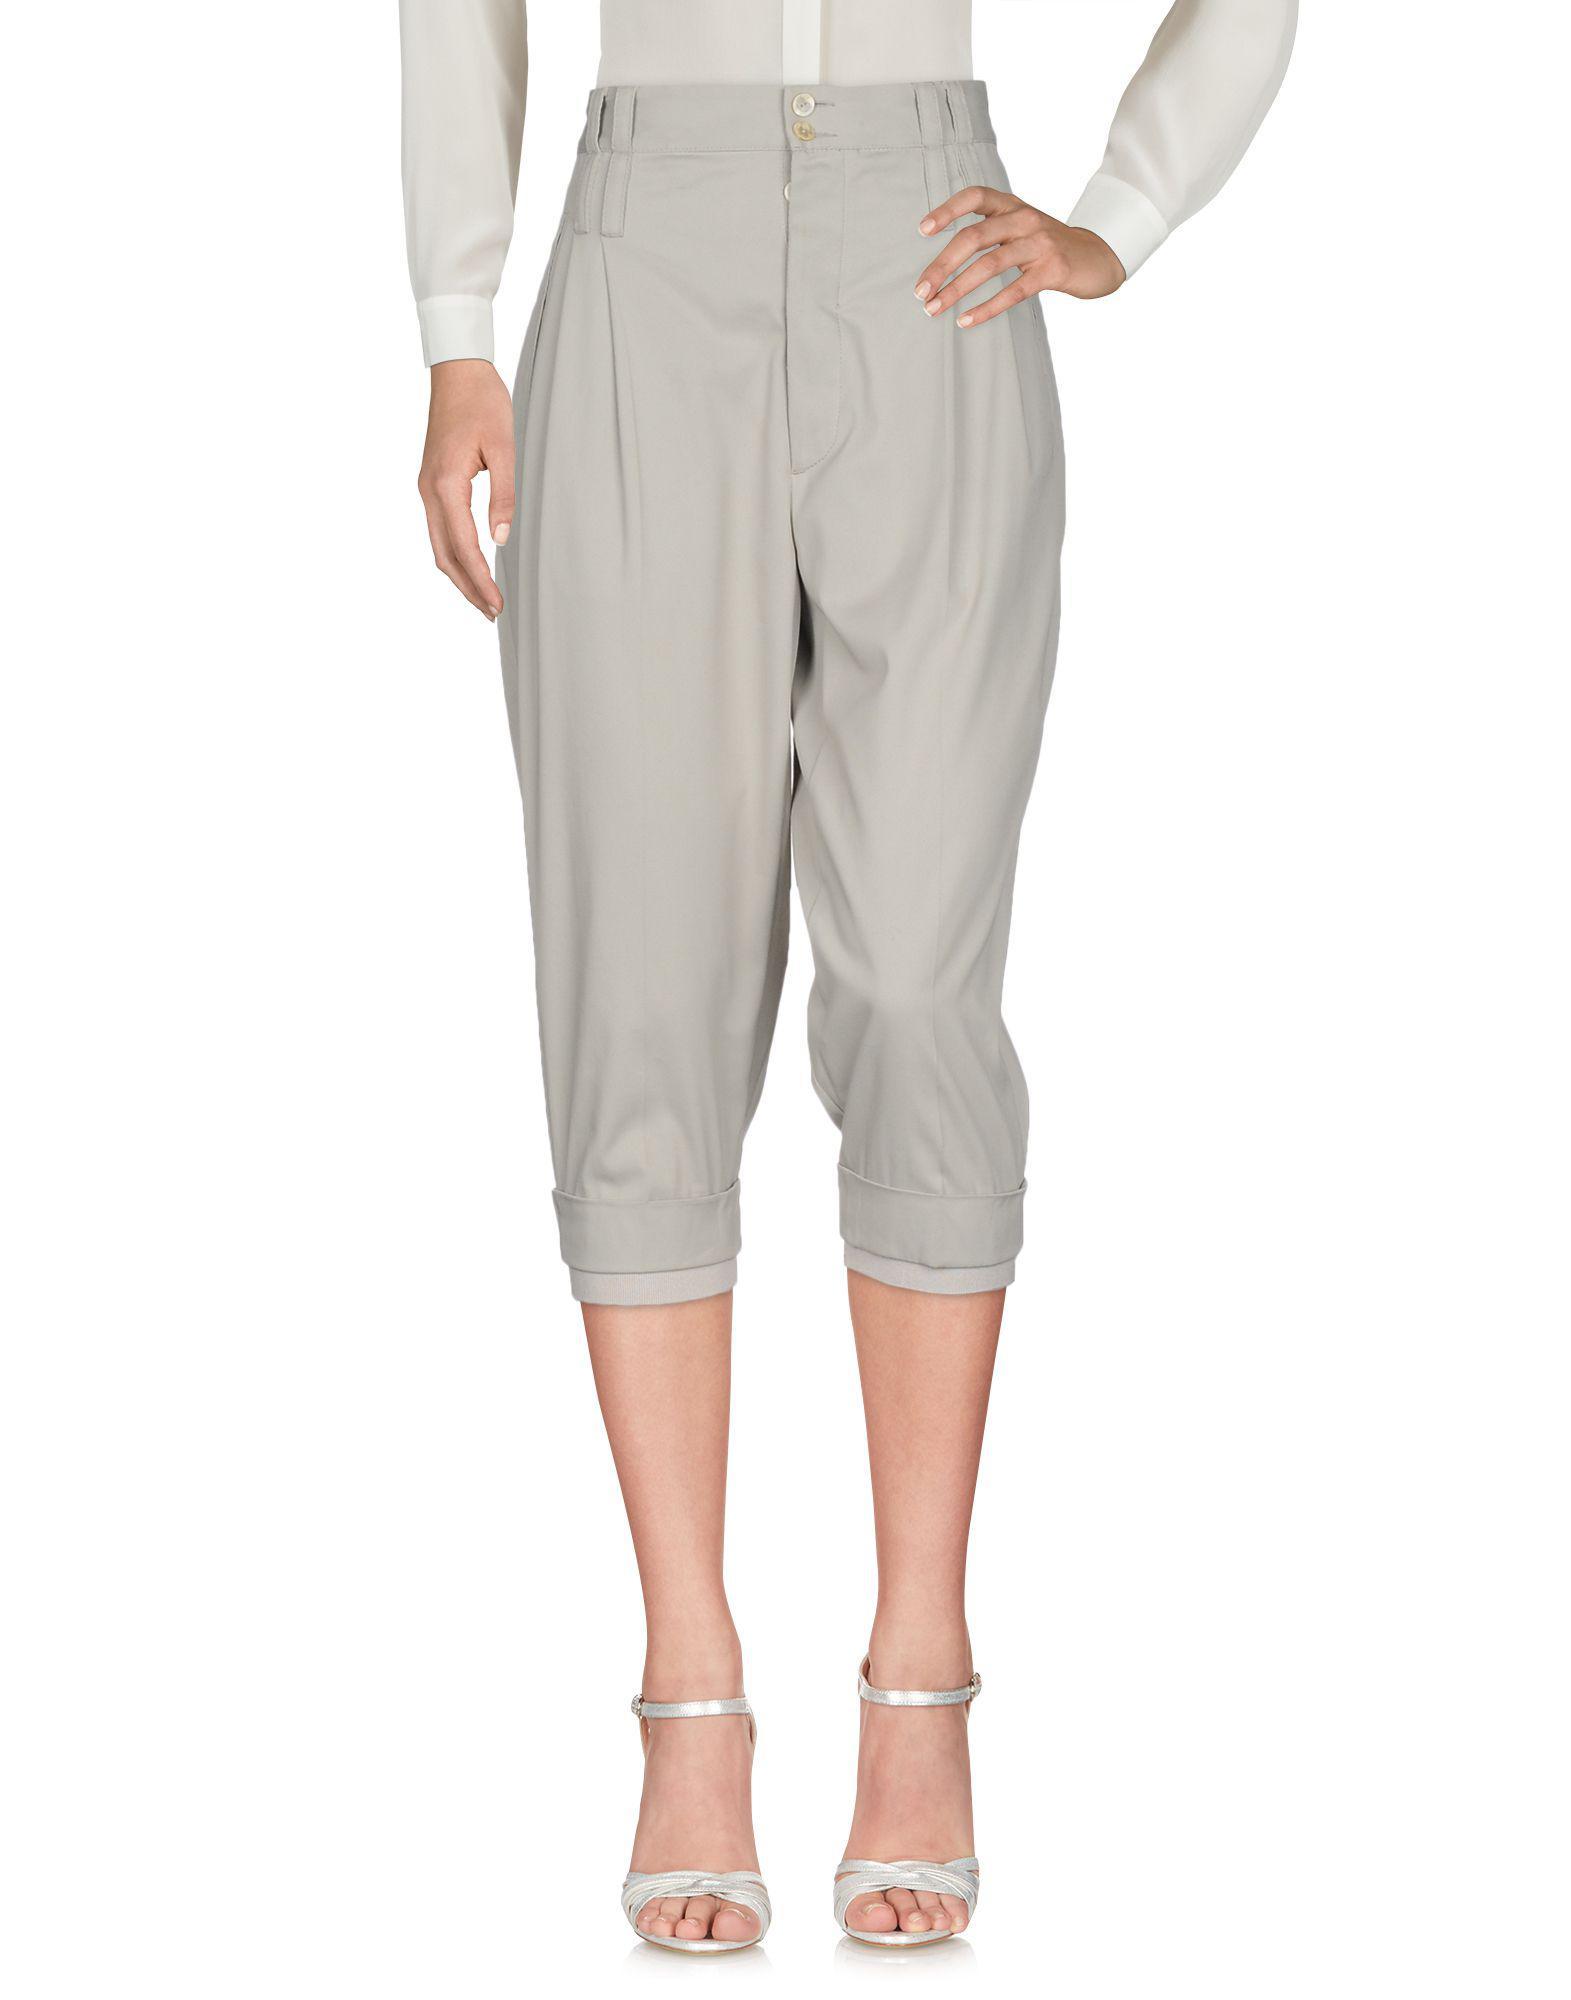 Les Pantalons - 3/4 Pantalons Longs Jean Paul Gaultier a7Kytg